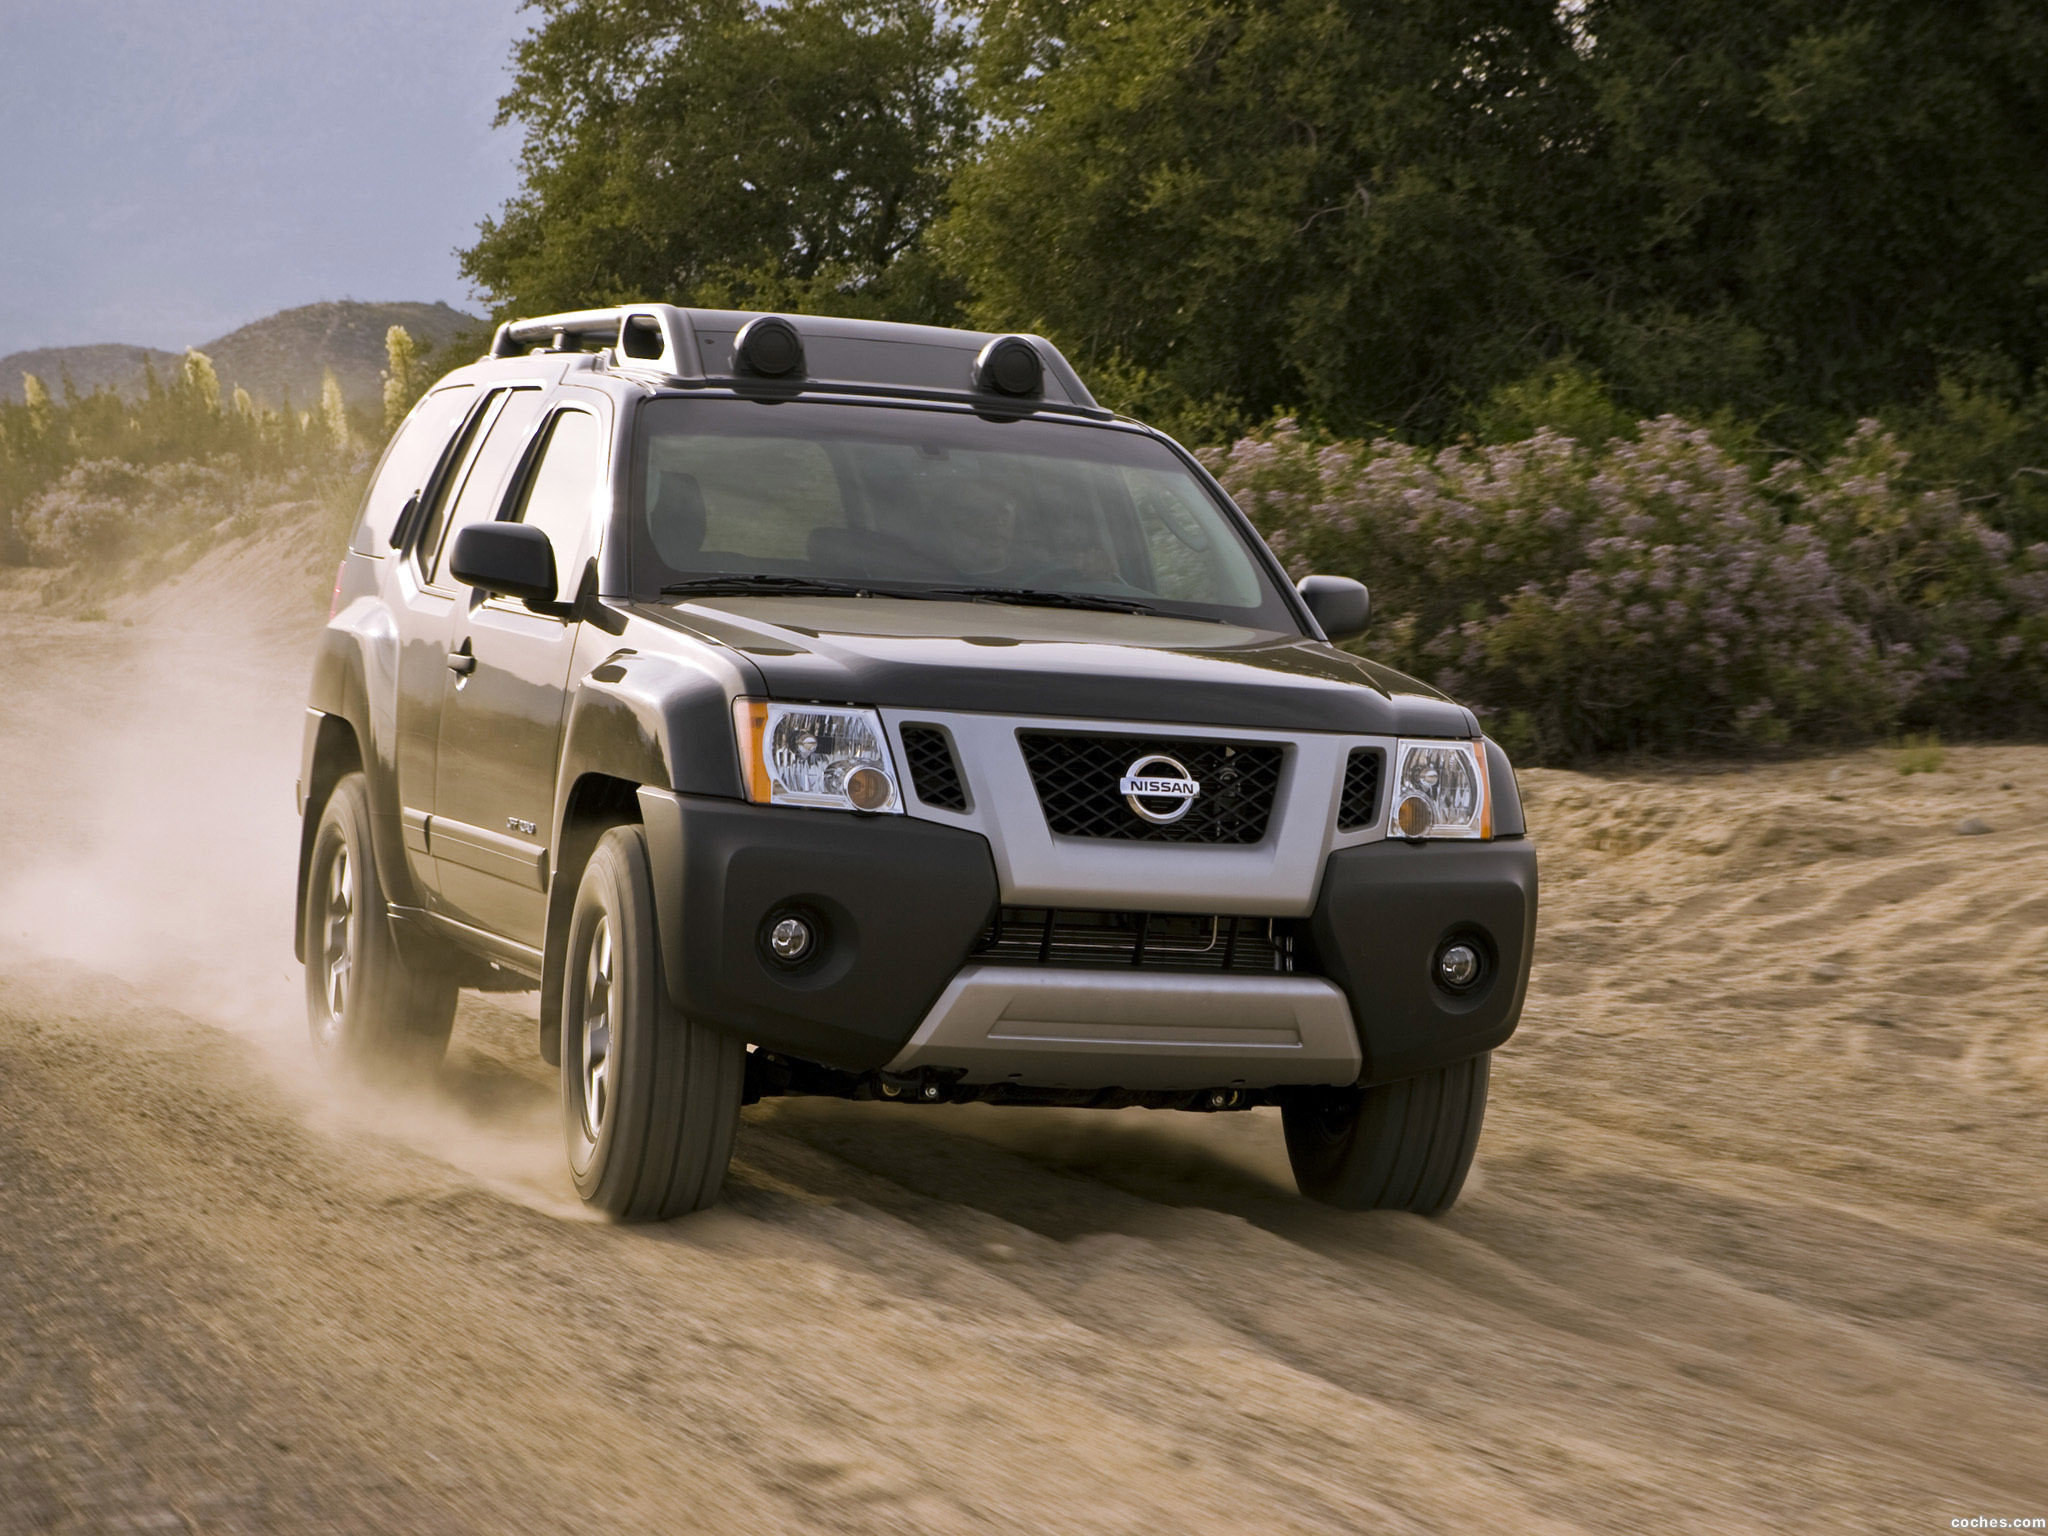 Foto 2 de Nissan Xterra 2009